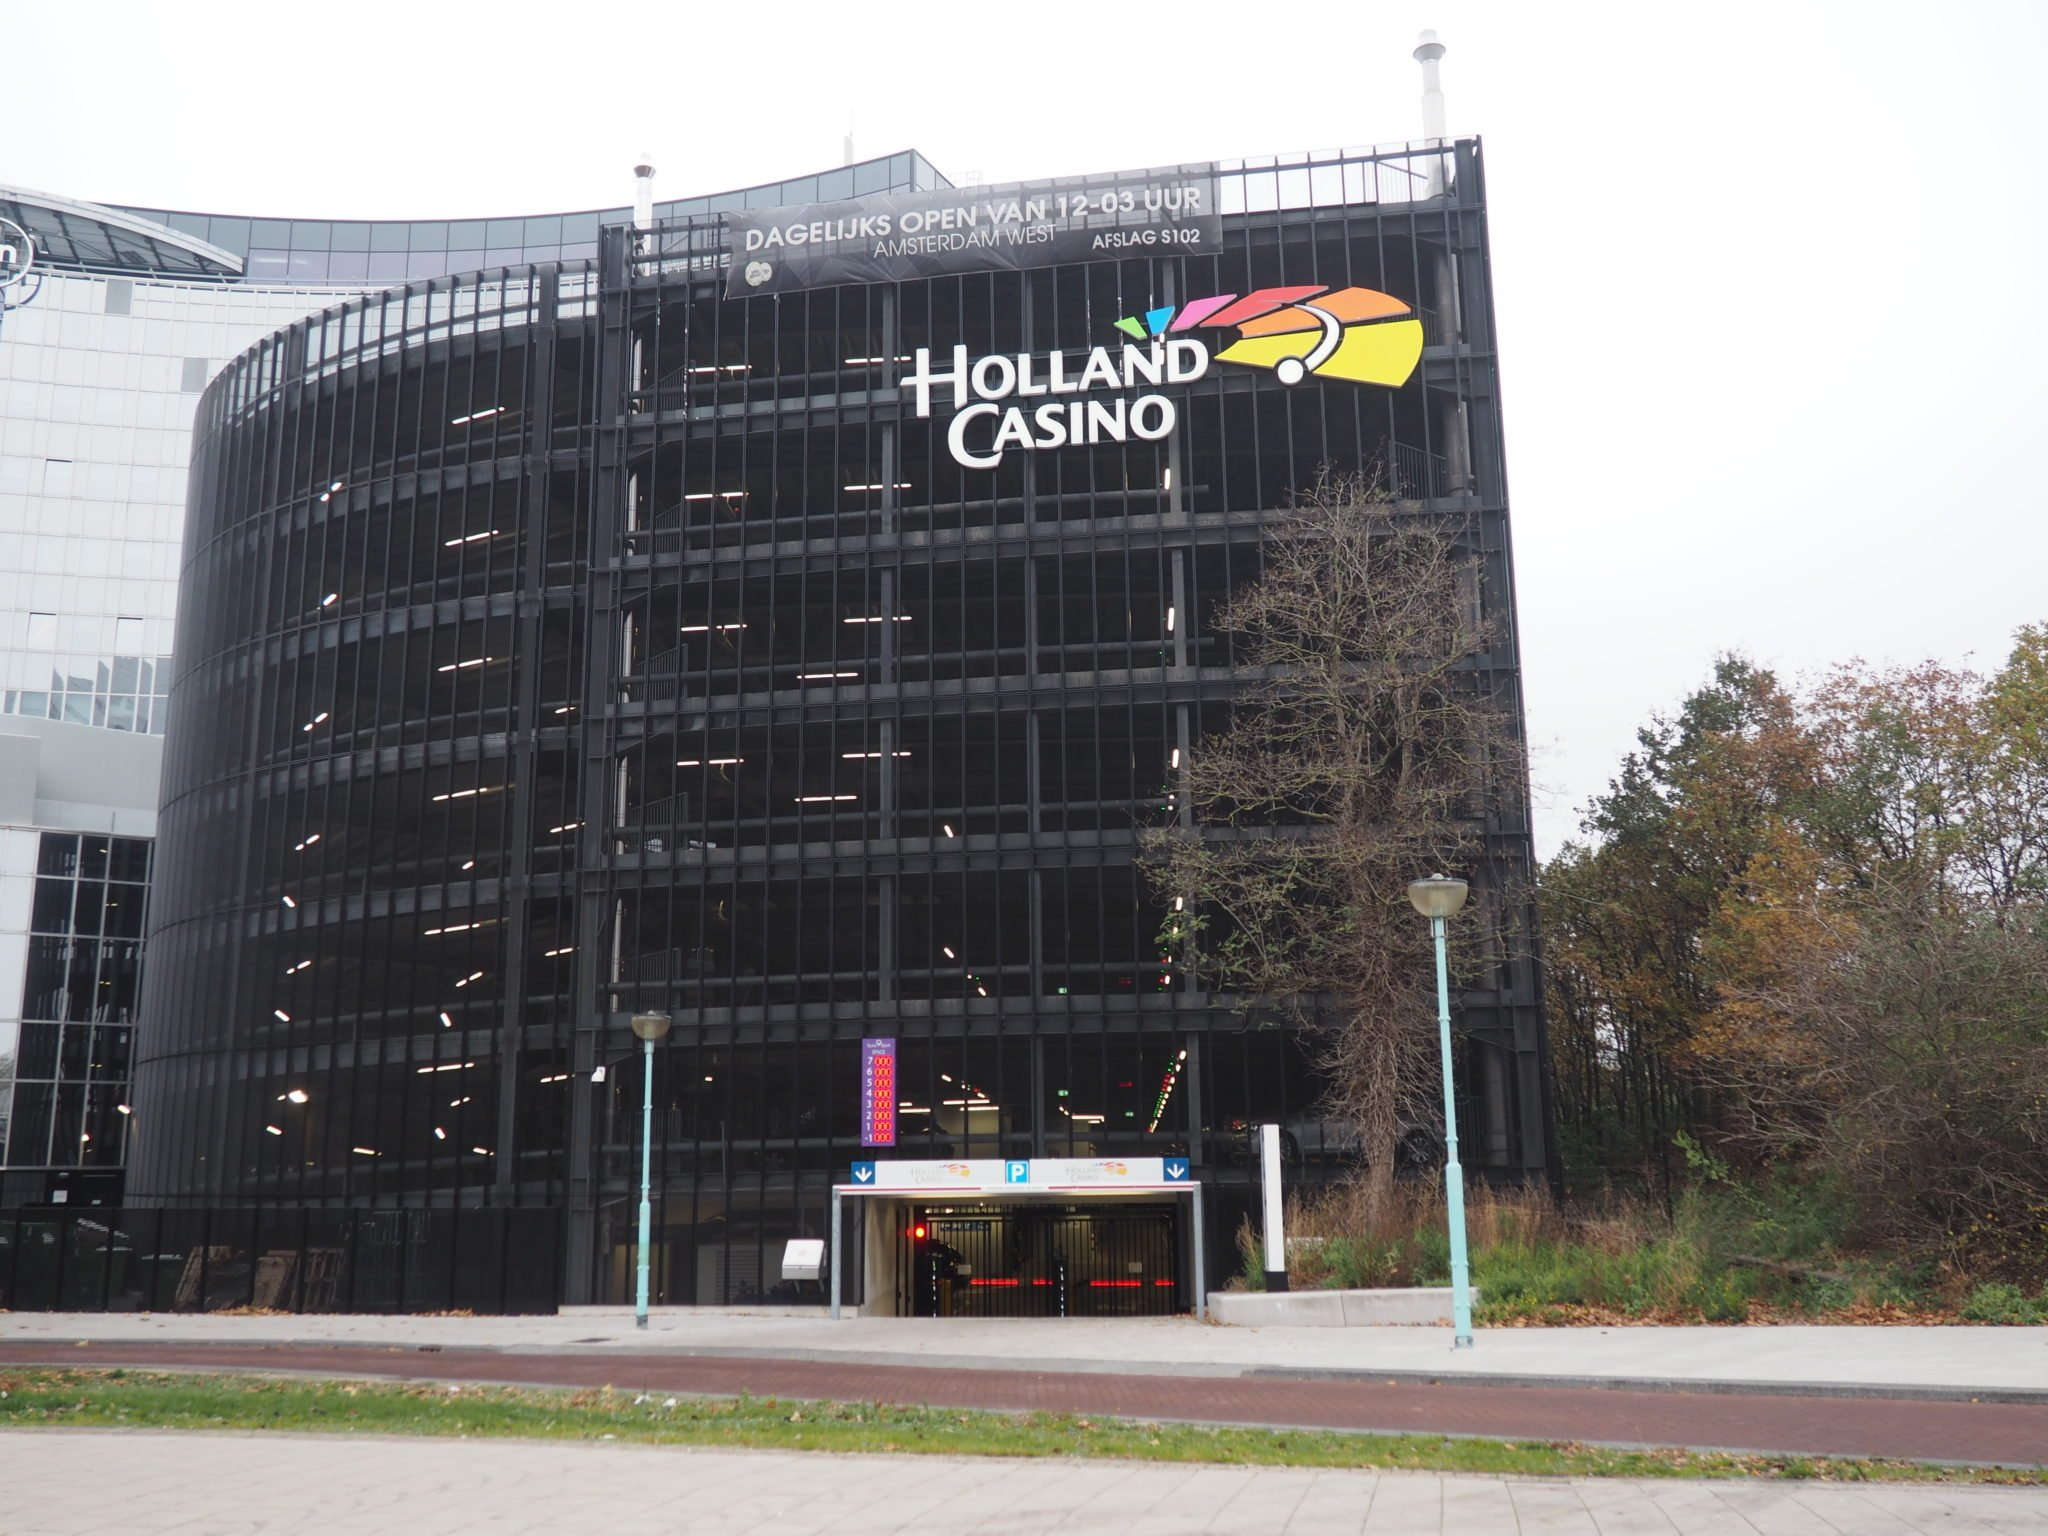 Holland Casino Sloterdijk